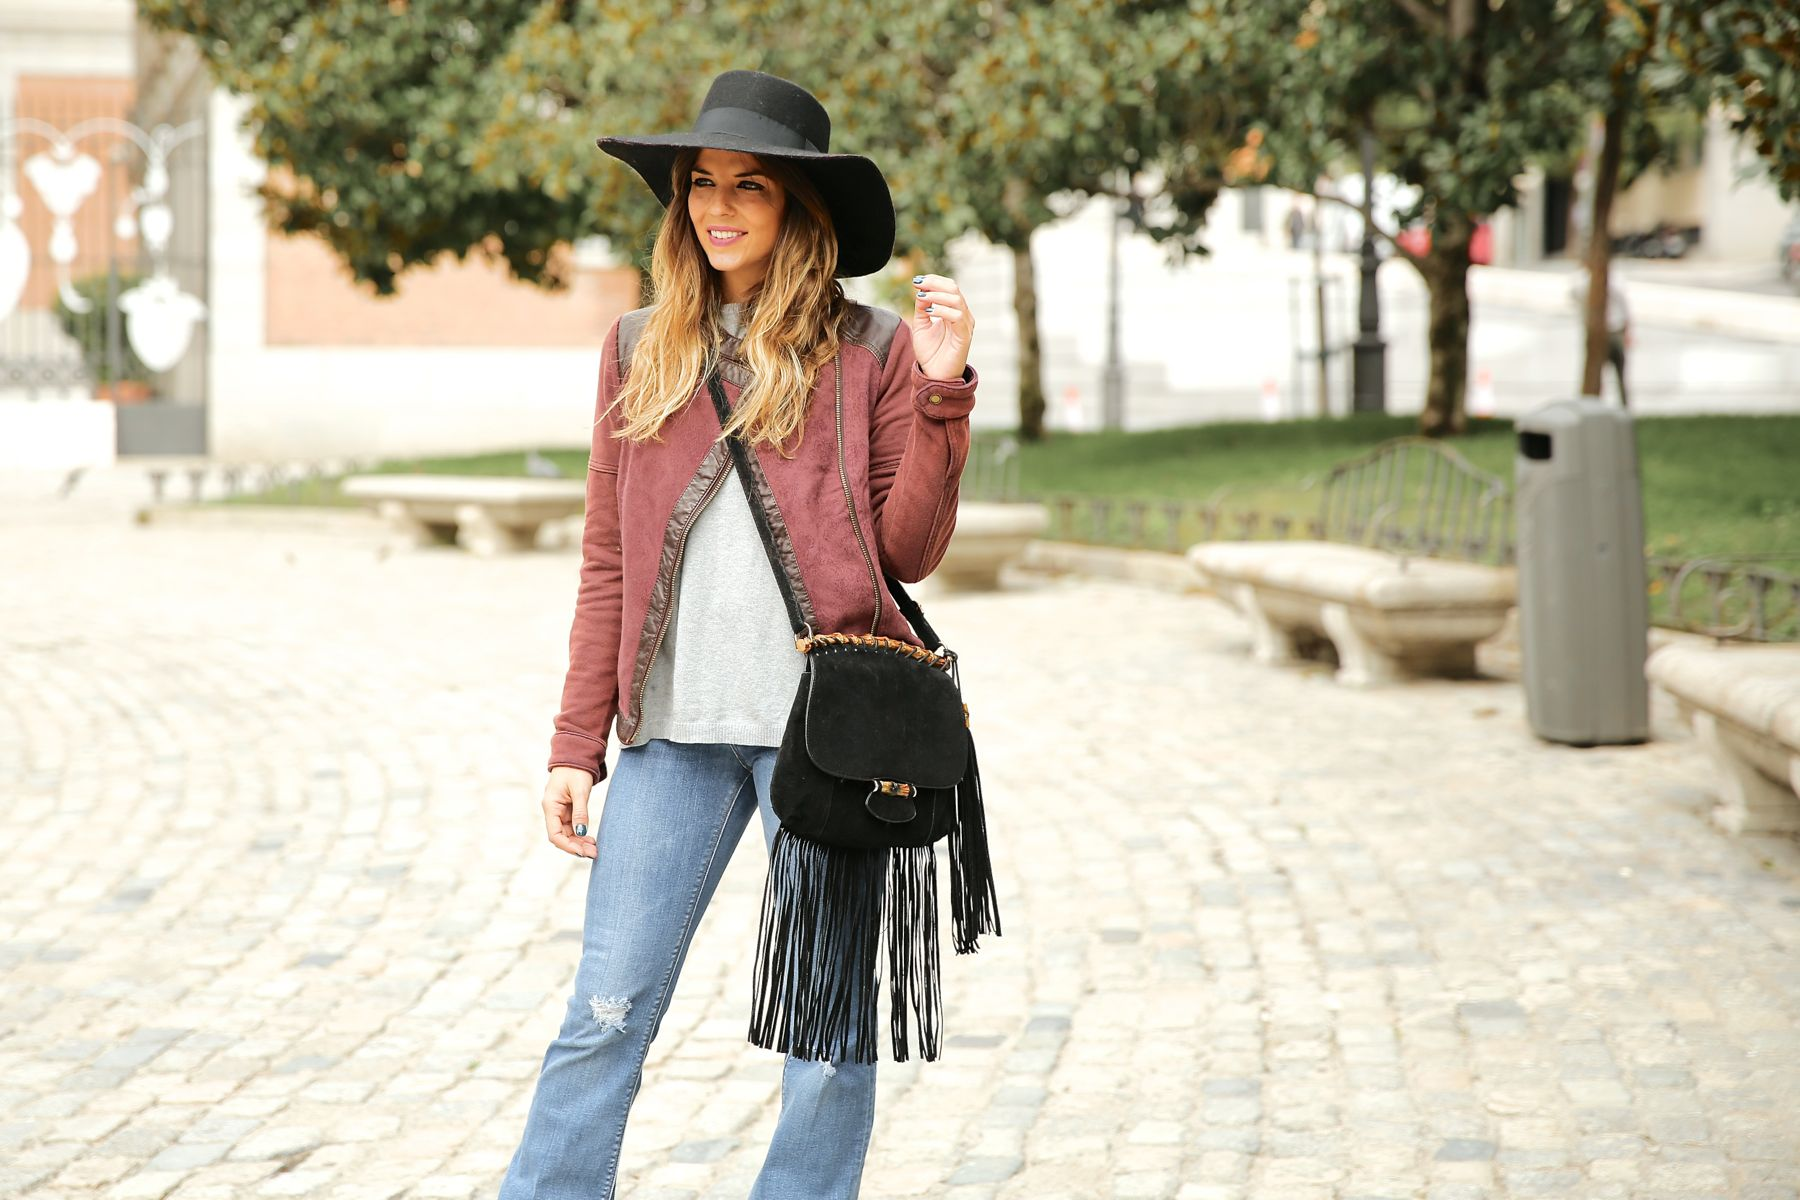 trendy_taste-look-outfit-street_style-ootd-blog-blogger-fashion_spain-moda_españa-AD-adolfo_dominguez-amaia_salamanca-boho-hippie-sombrero-hat-biker-flecos-fringes-6